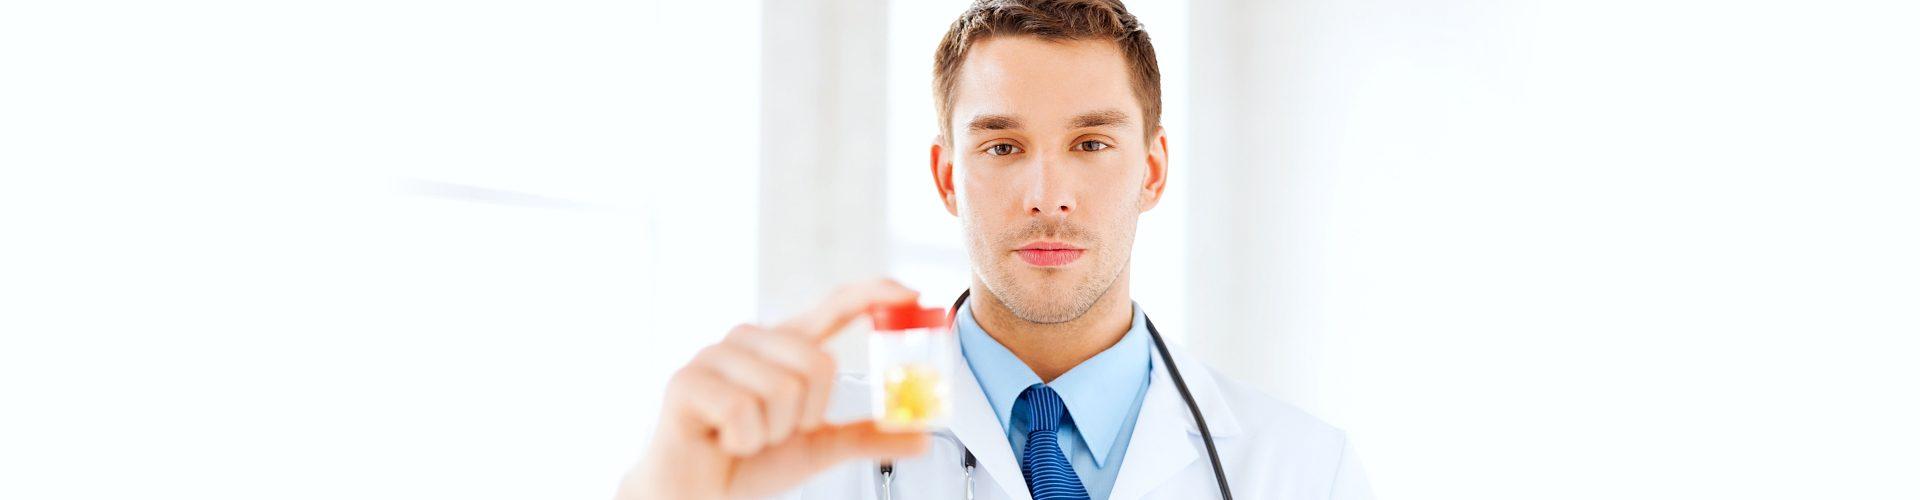 man holding medicine container